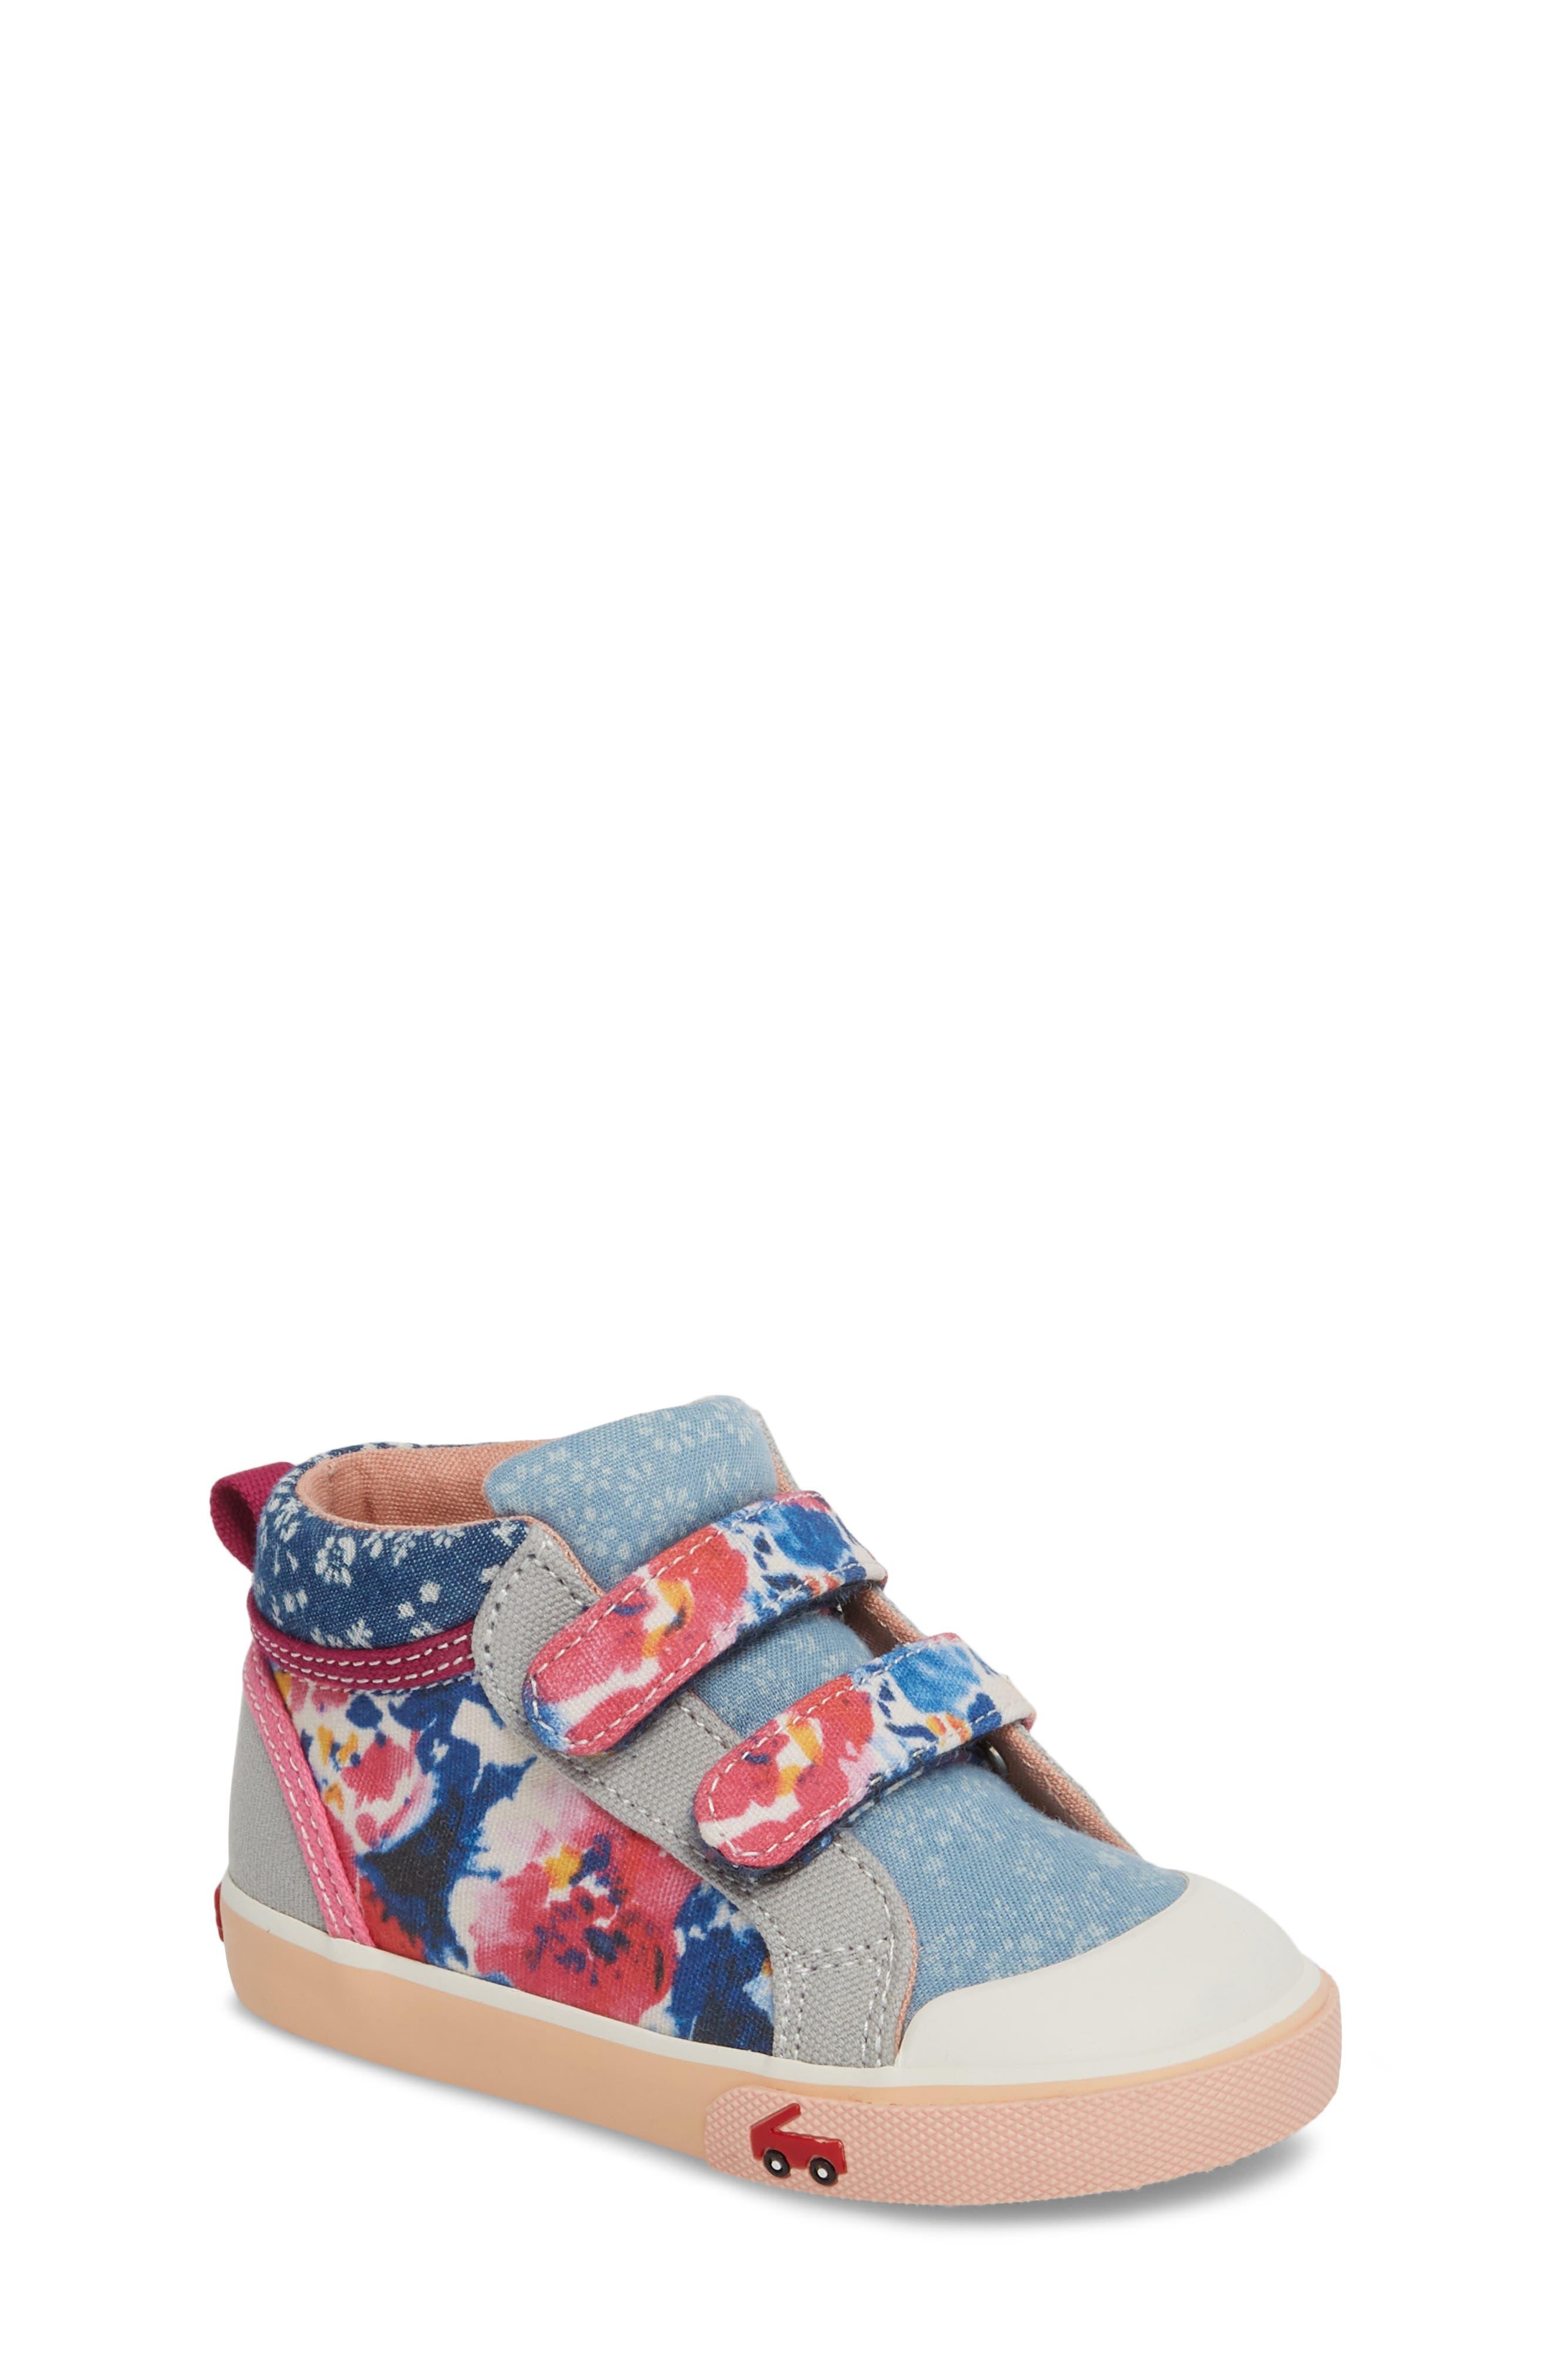 Alternate Image 1 Selected - See Kai Run Kya Sneaker (Baby, Walker, Toddler & Little Kid)